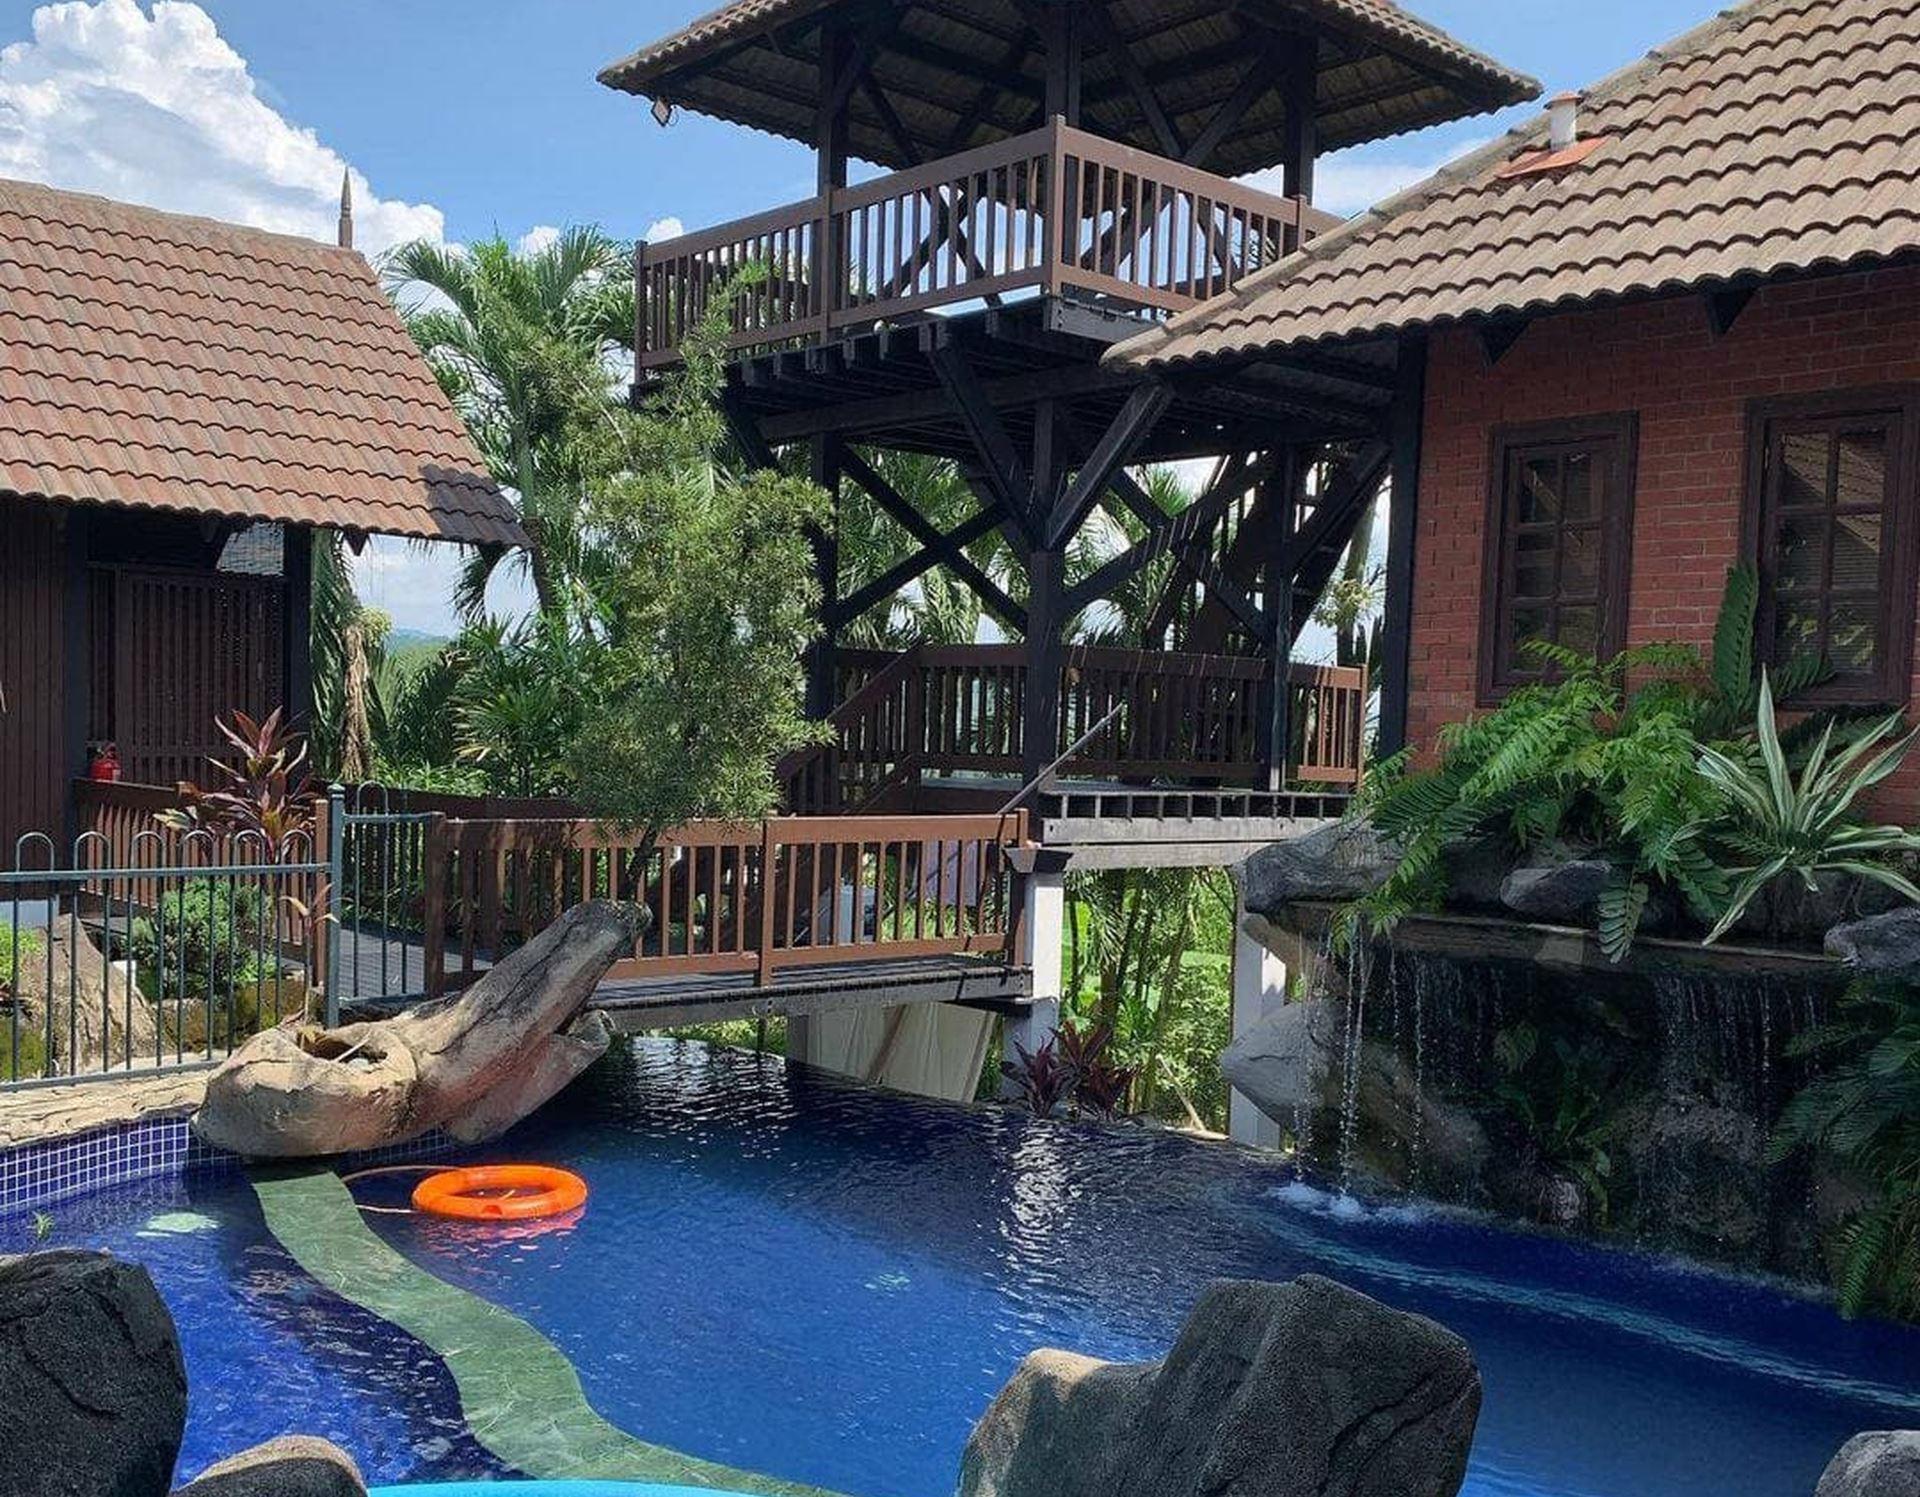 5 staycation spots for your weekend getaway in selangor!